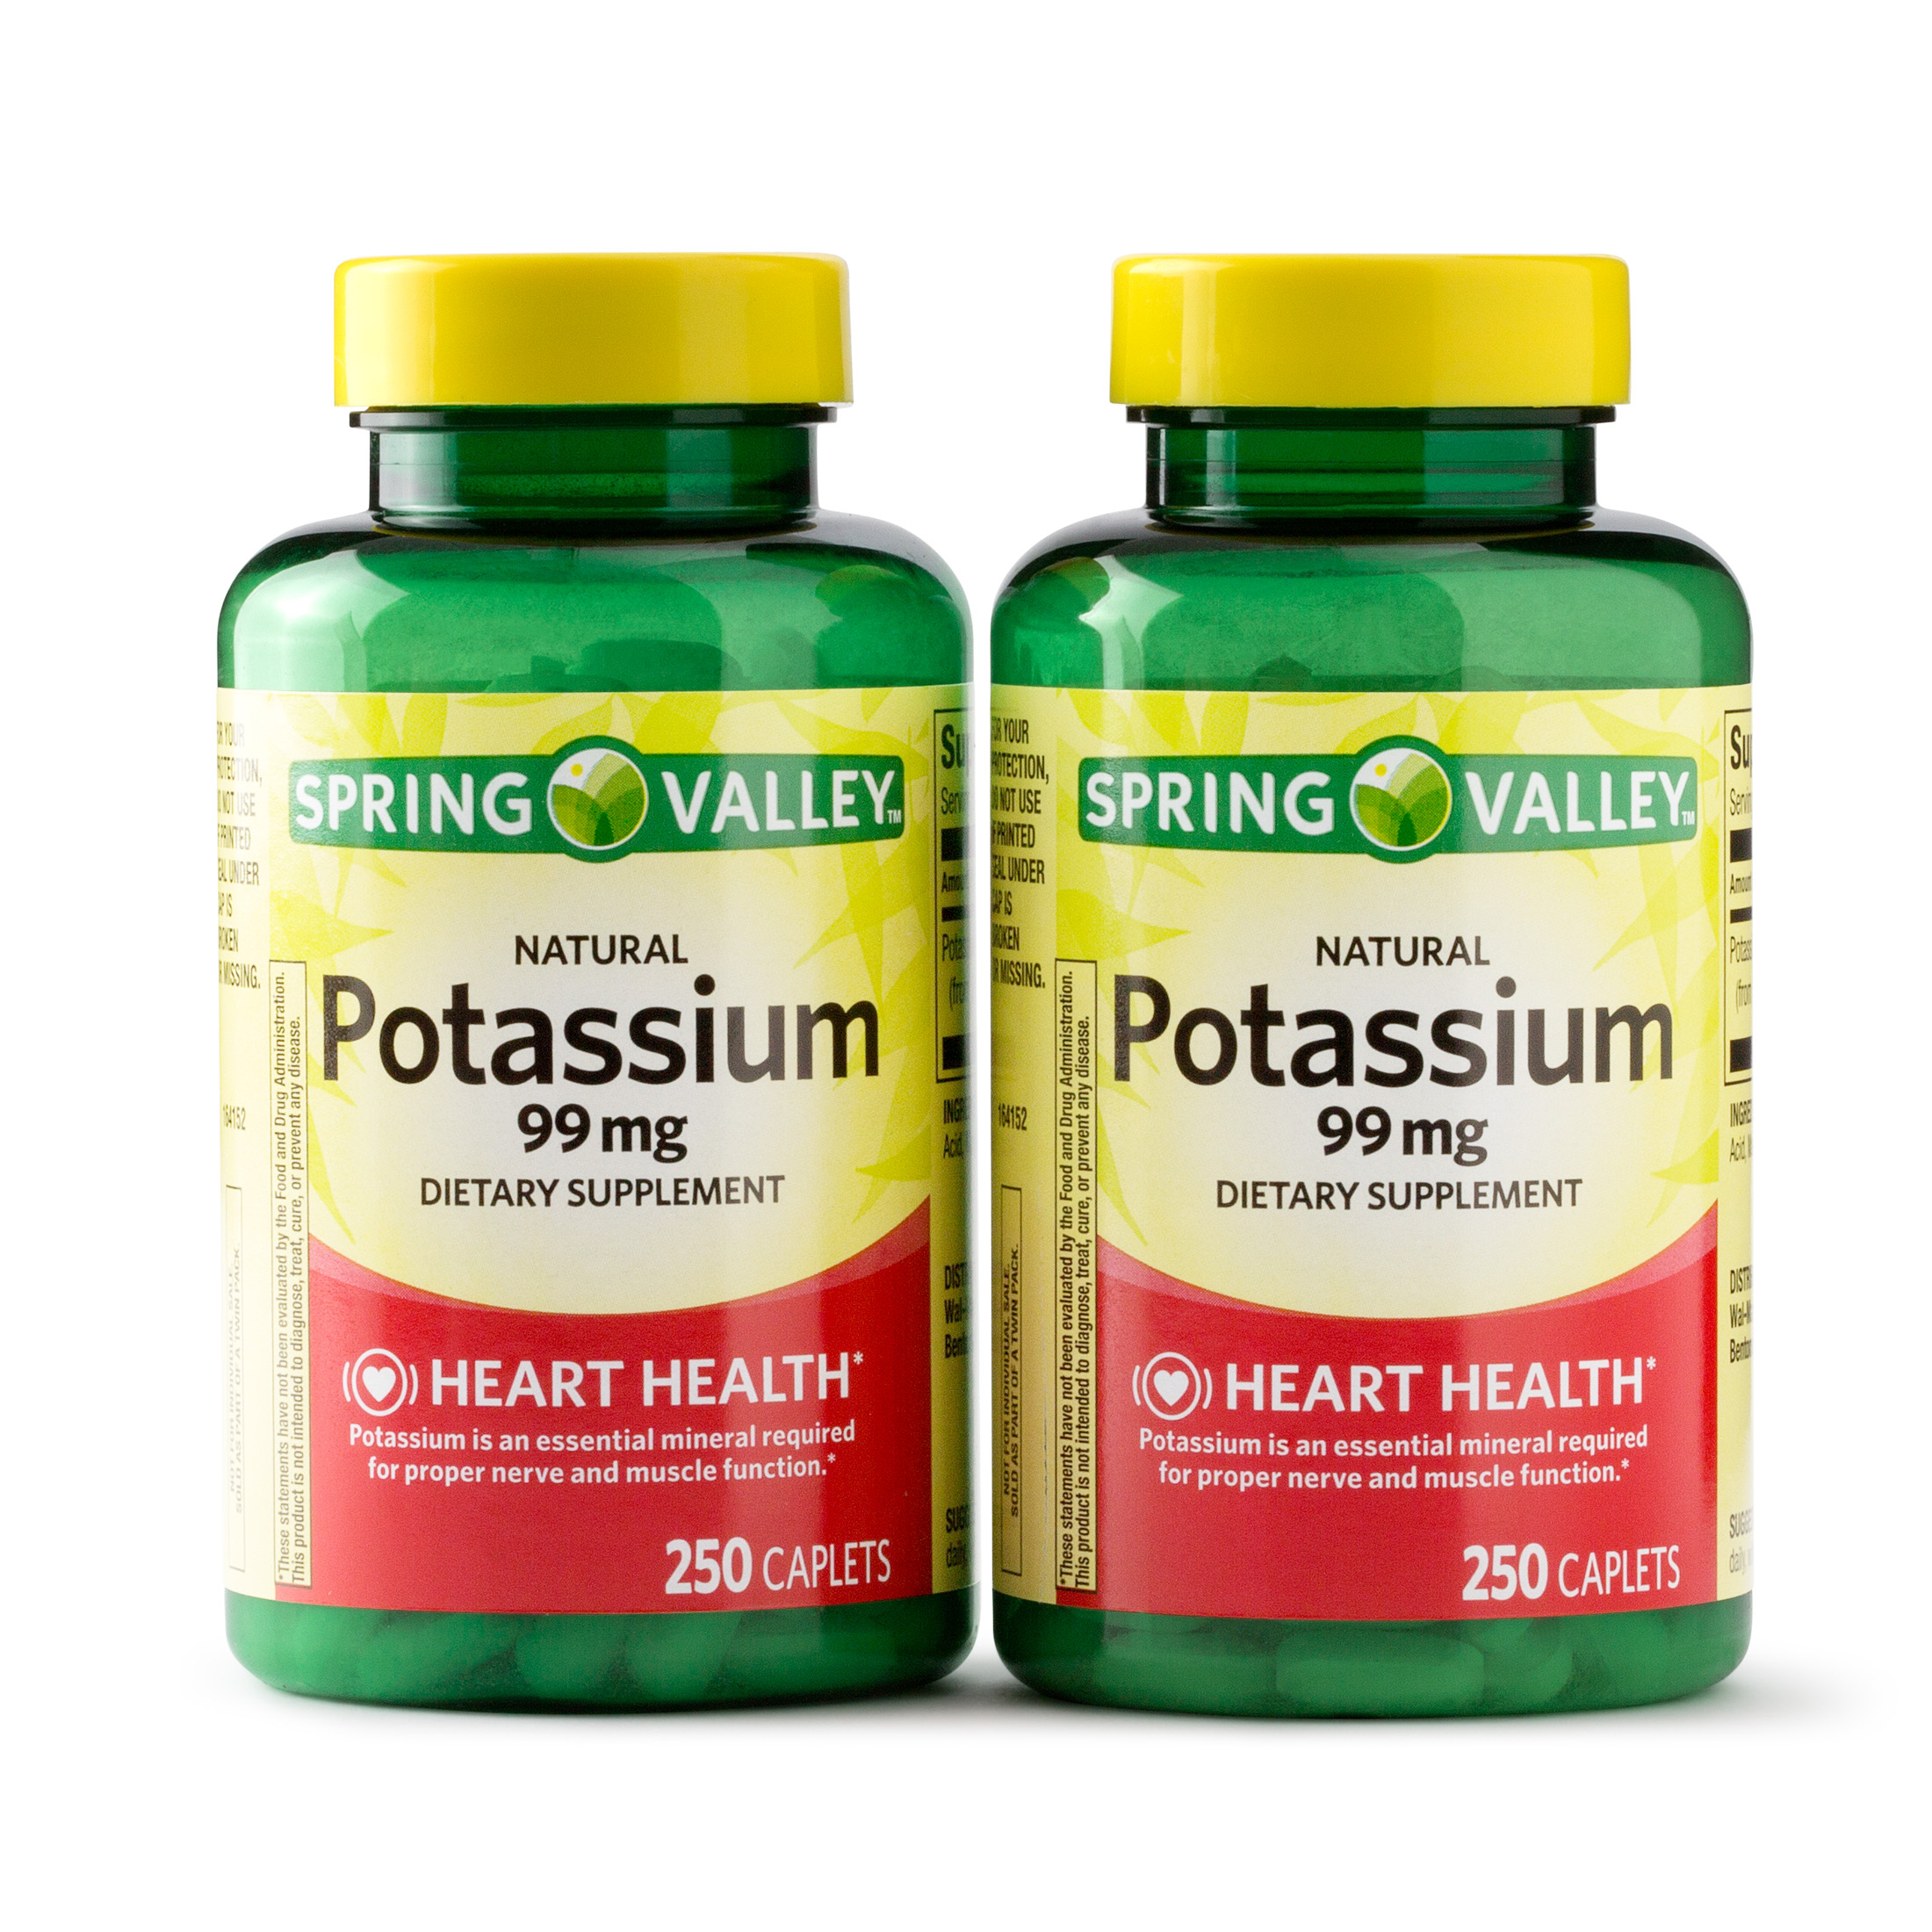 Spring Valley Potassium Caplets, 99 mg, 250 Ct